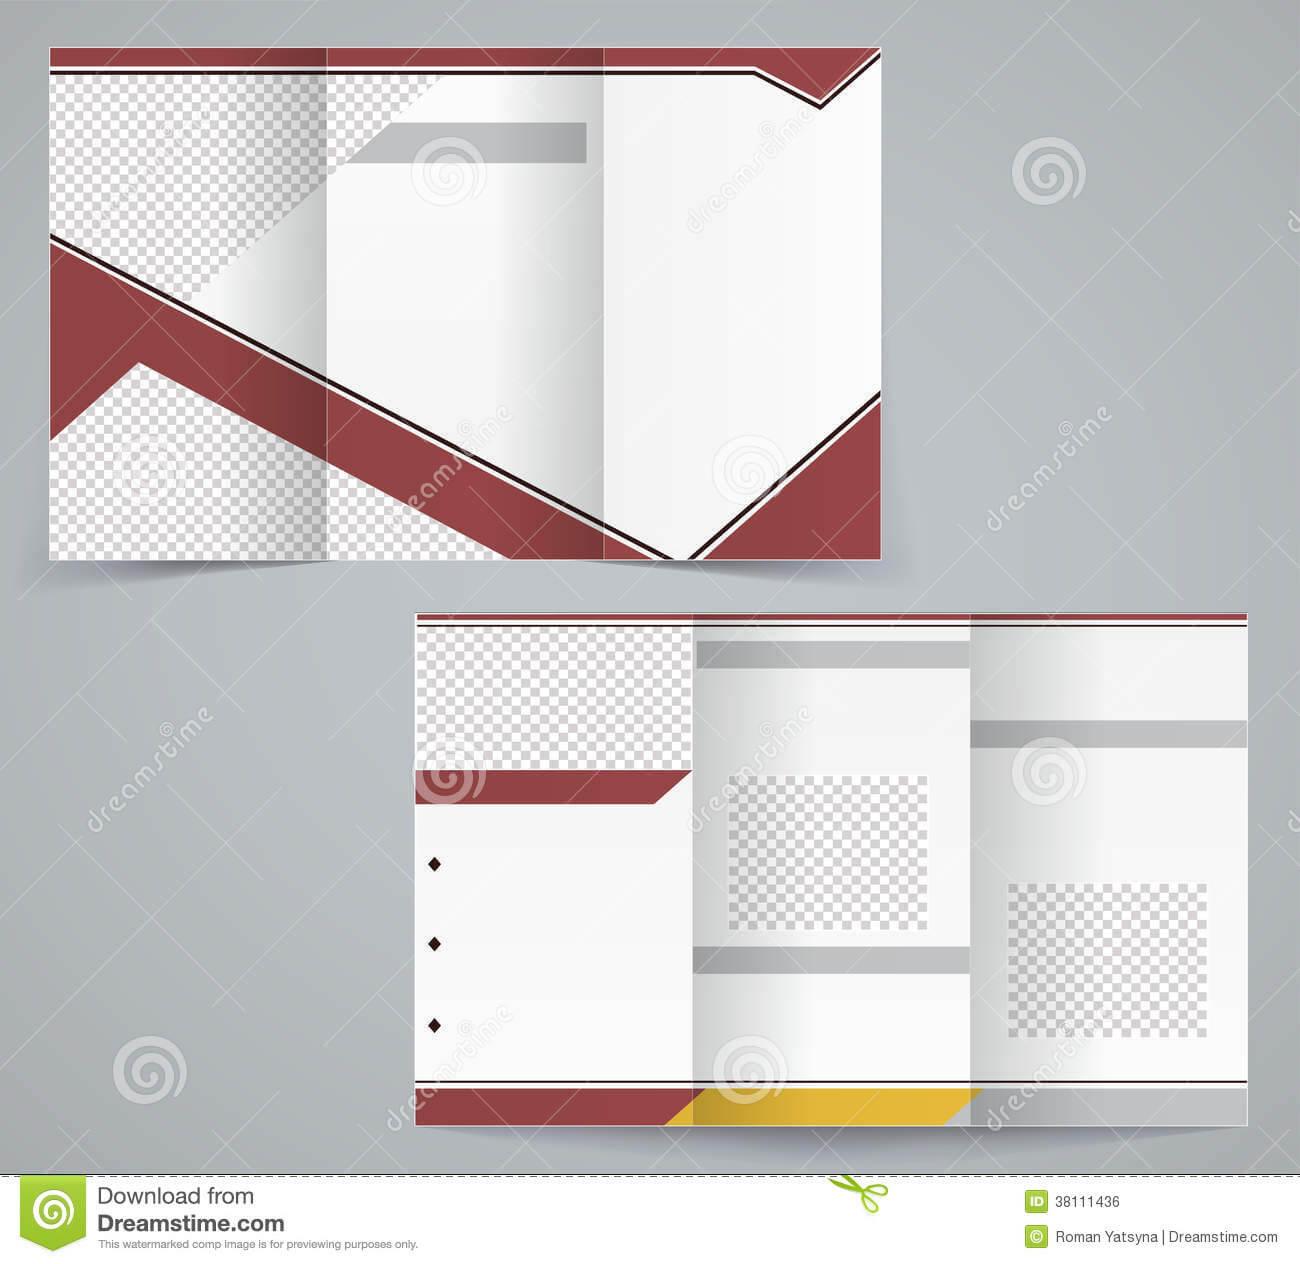 Tri Fold Business Brochure Template Stock Vector Throughout Free Tri Fold Business Brochure Templates